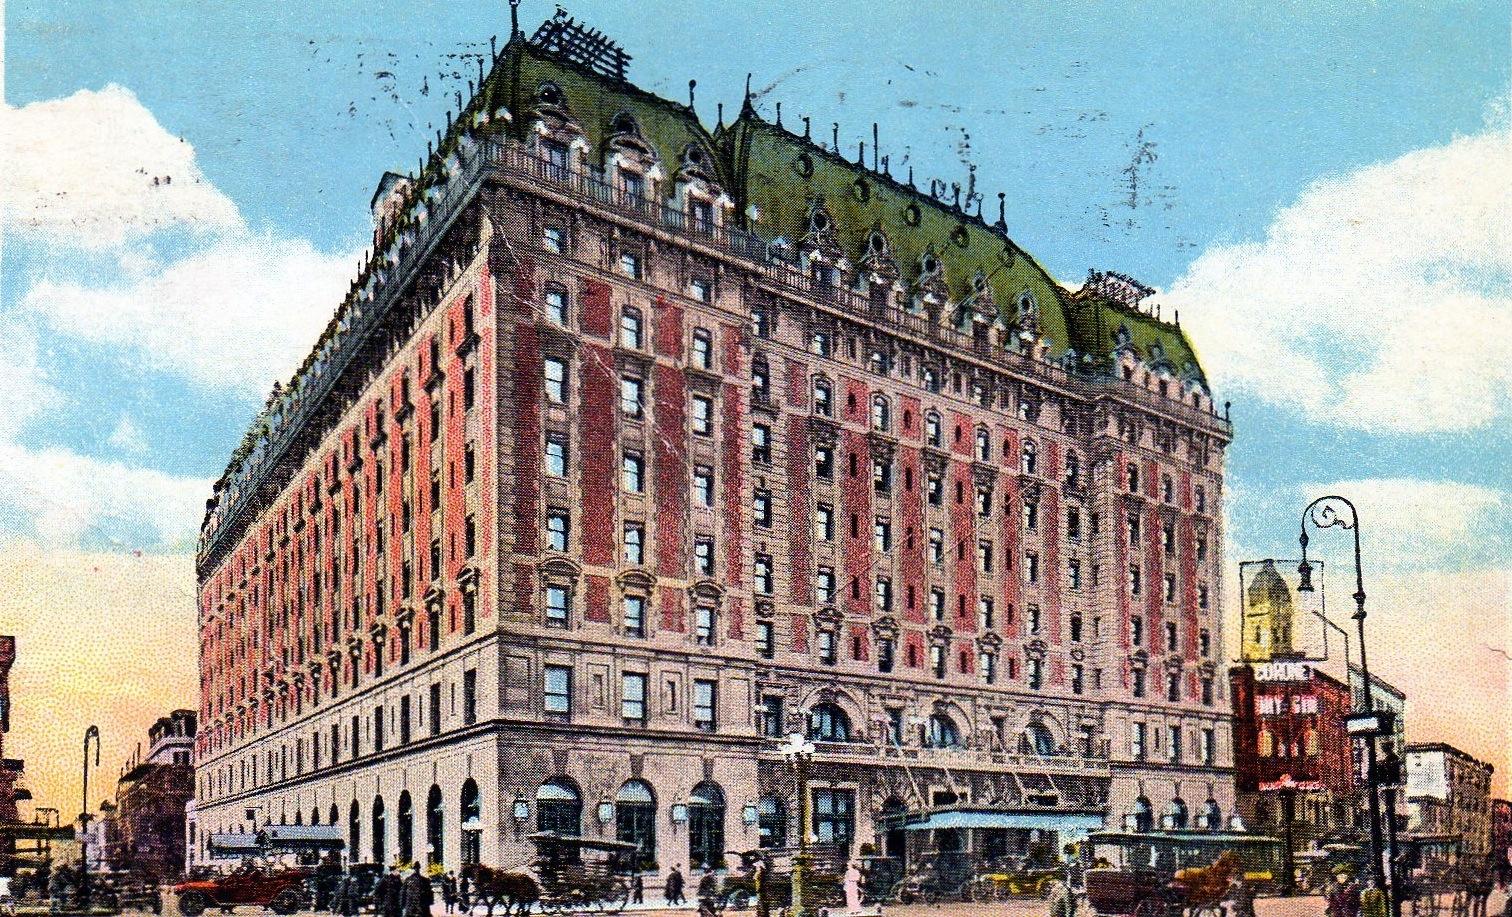 Hotel astor ephemeral new york for Hotel new york